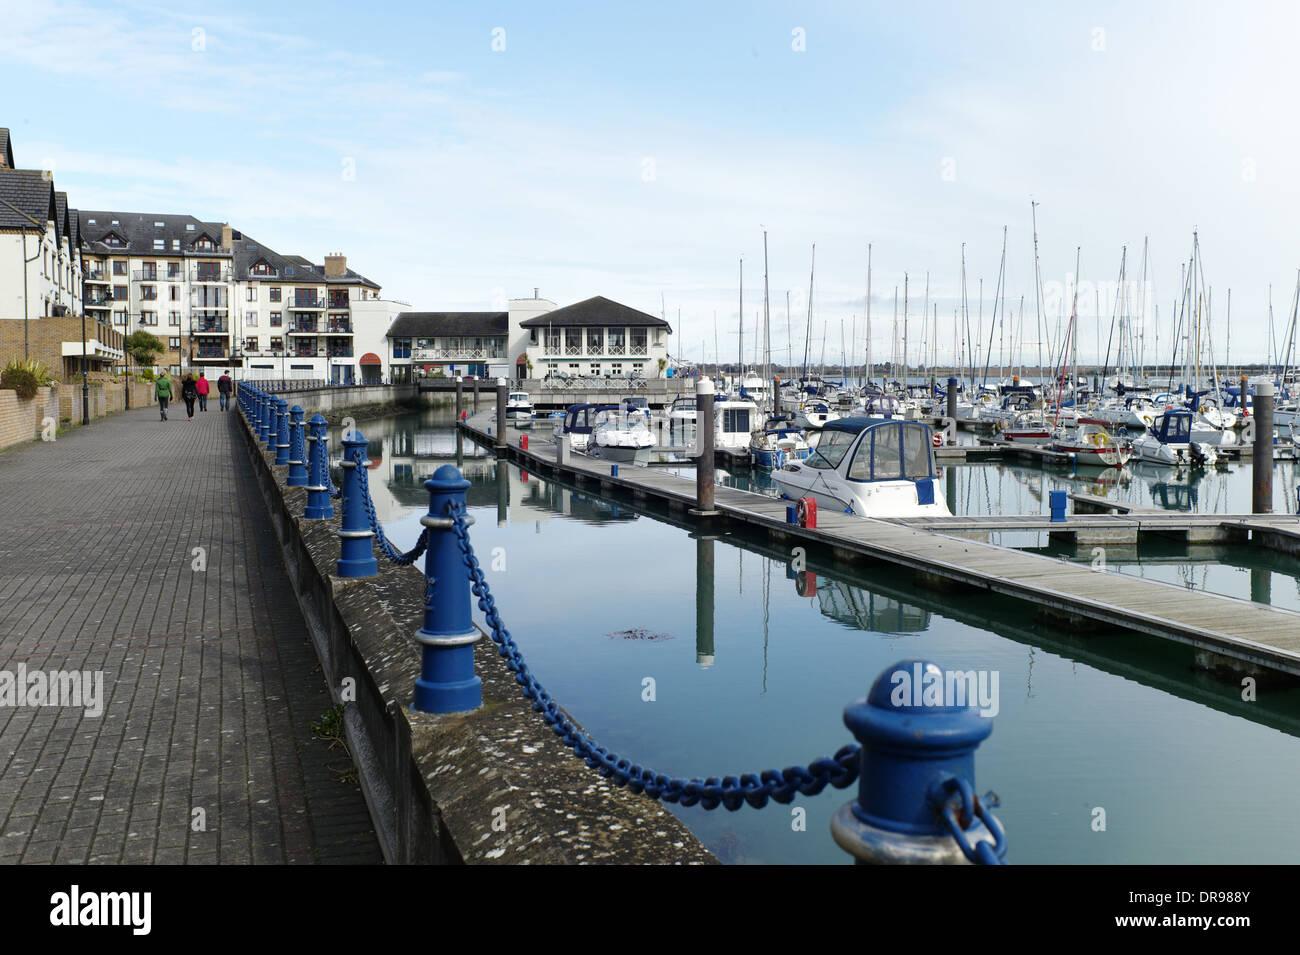 The marina with its boats and apartments at Malahide, Dublin, Ireland - Stock Image